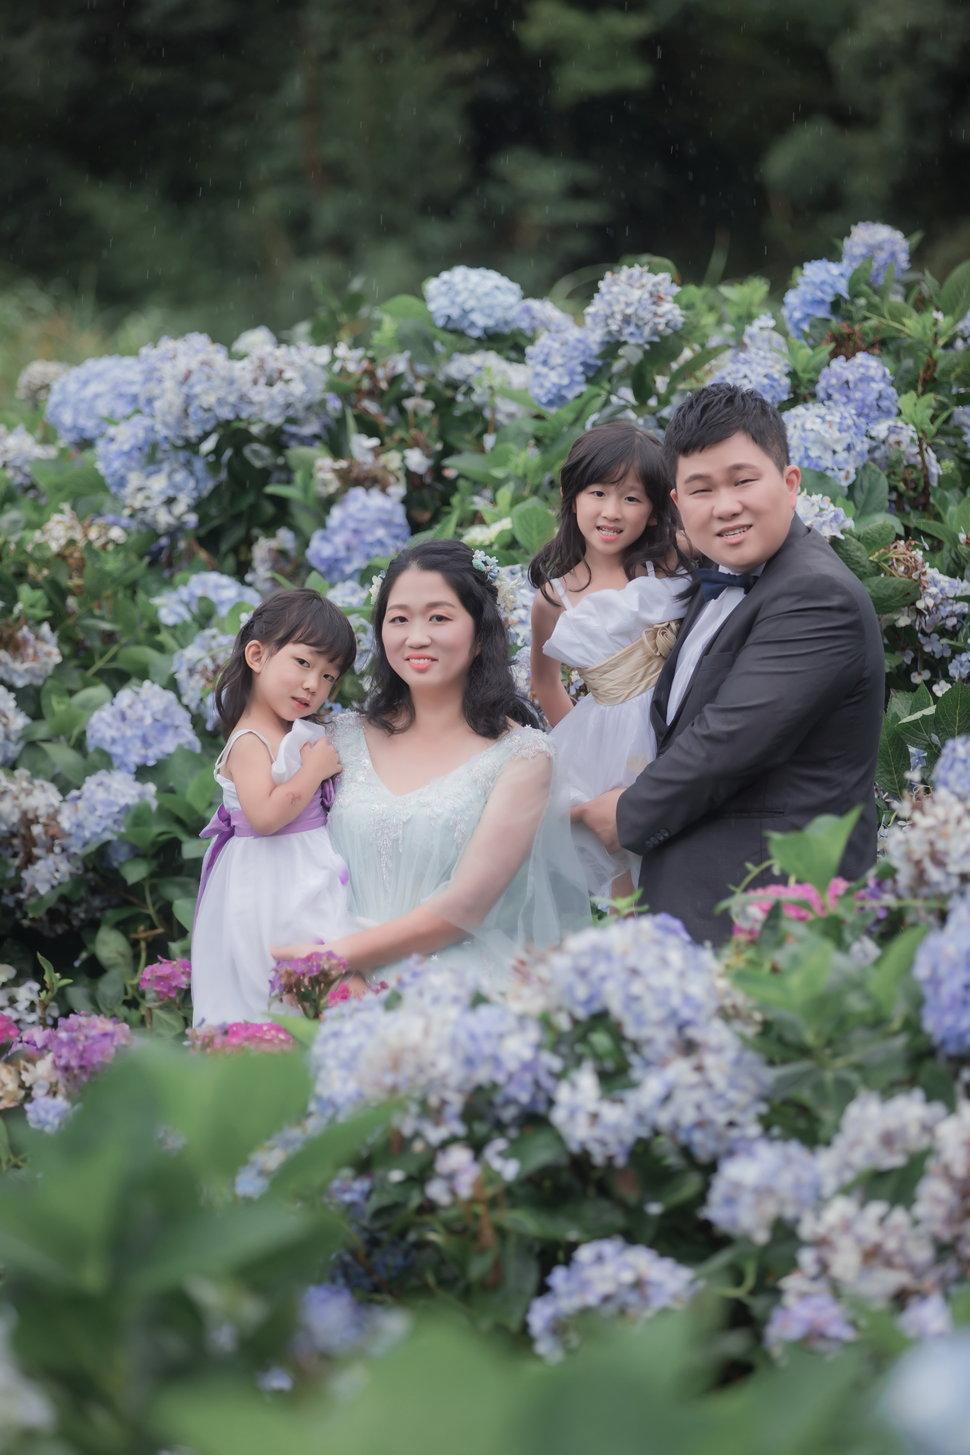 PP_0006_調整大小 - 巴黎婚紗攝影台灣總店《結婚吧》